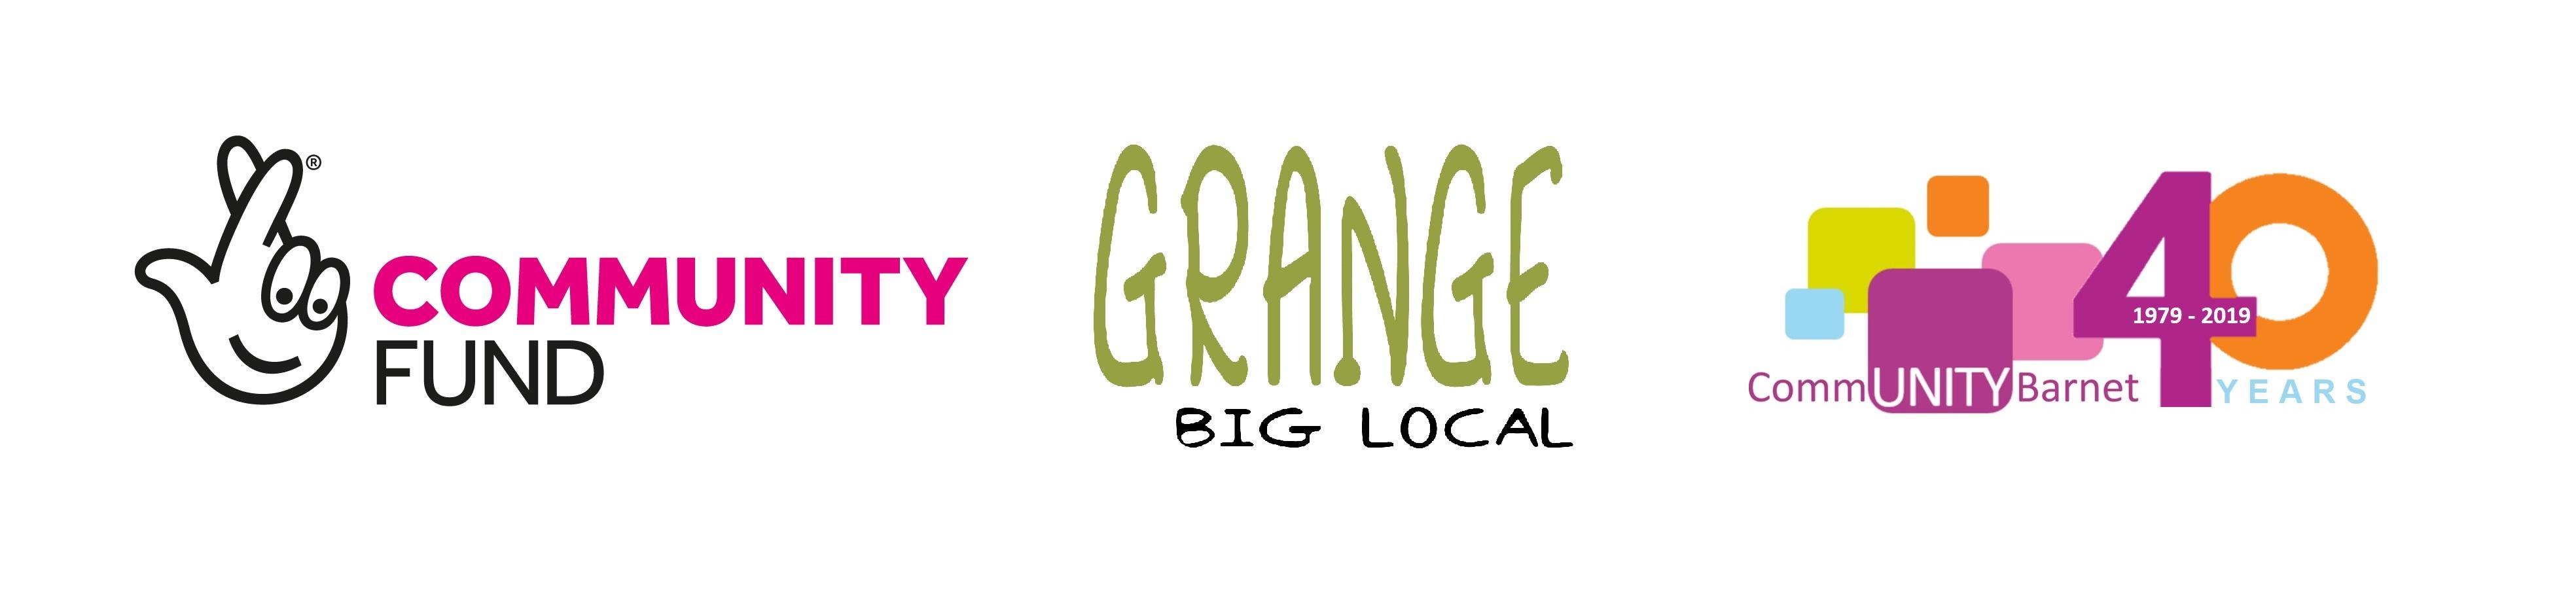 Grange Big Local, Lottery Fund and Community Barnet logos